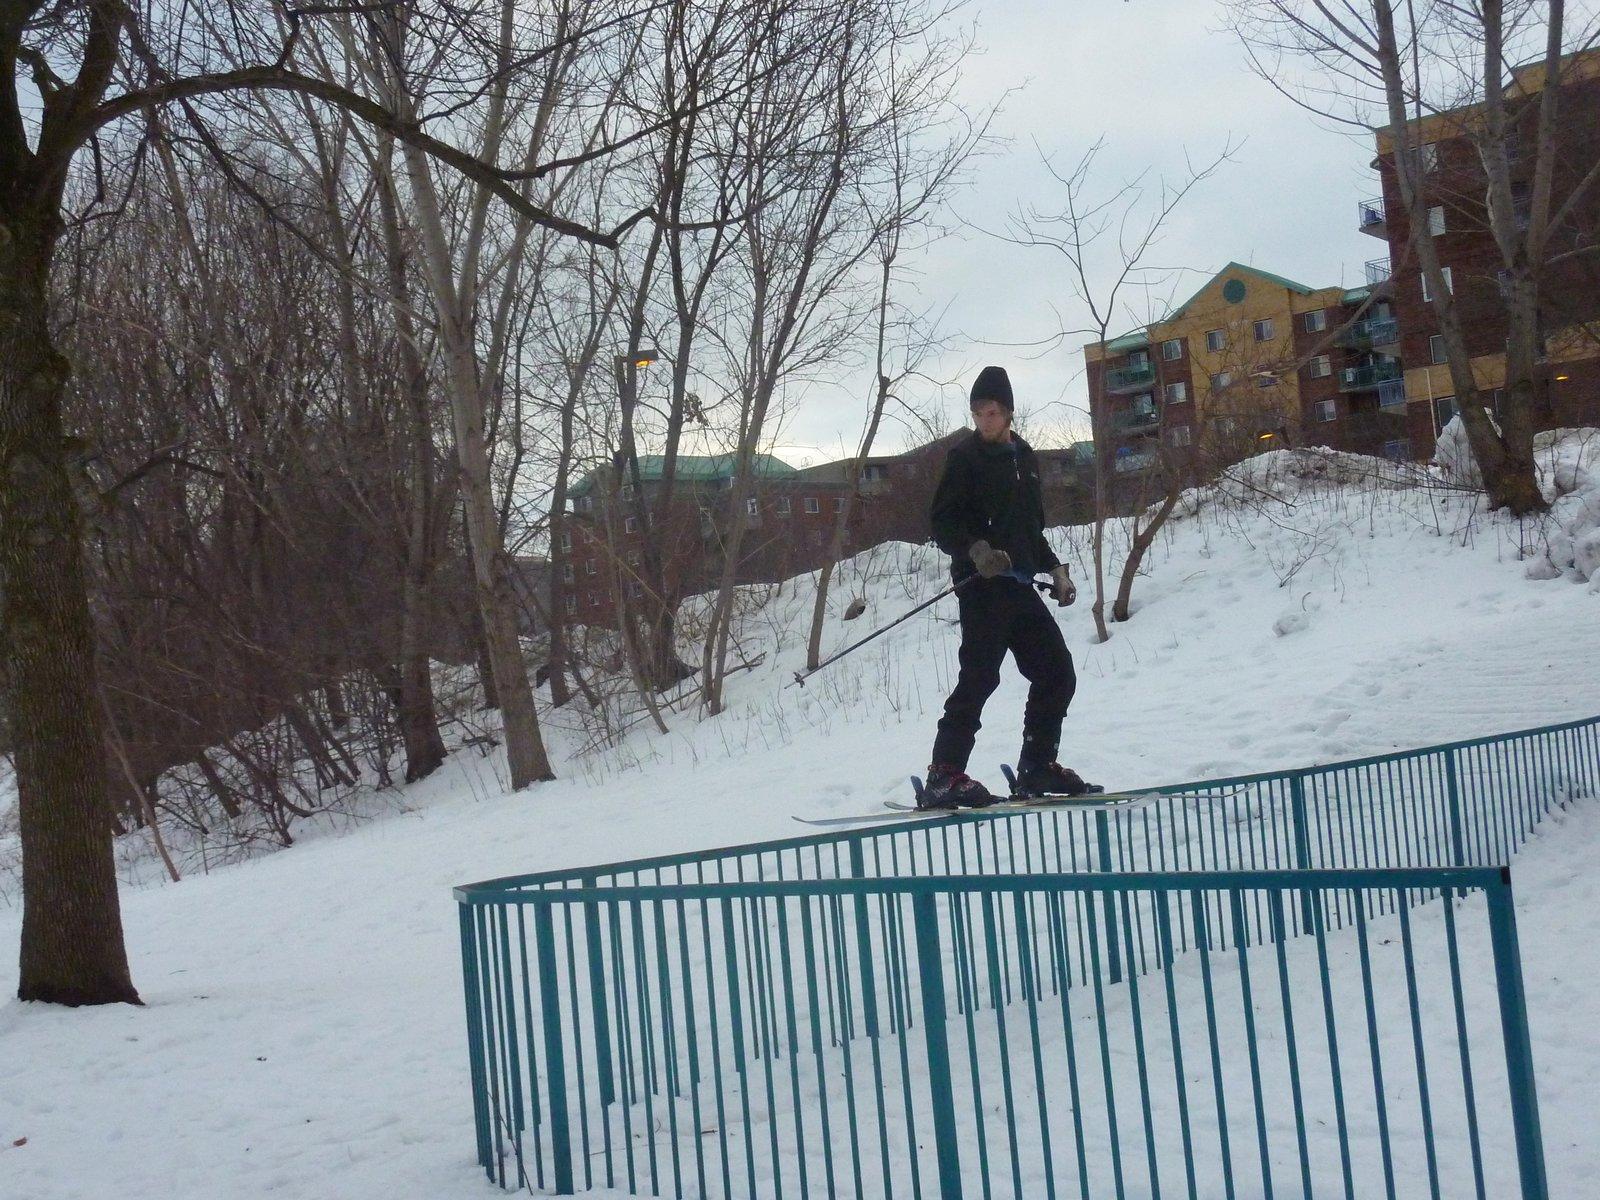 Sandy Hill rail